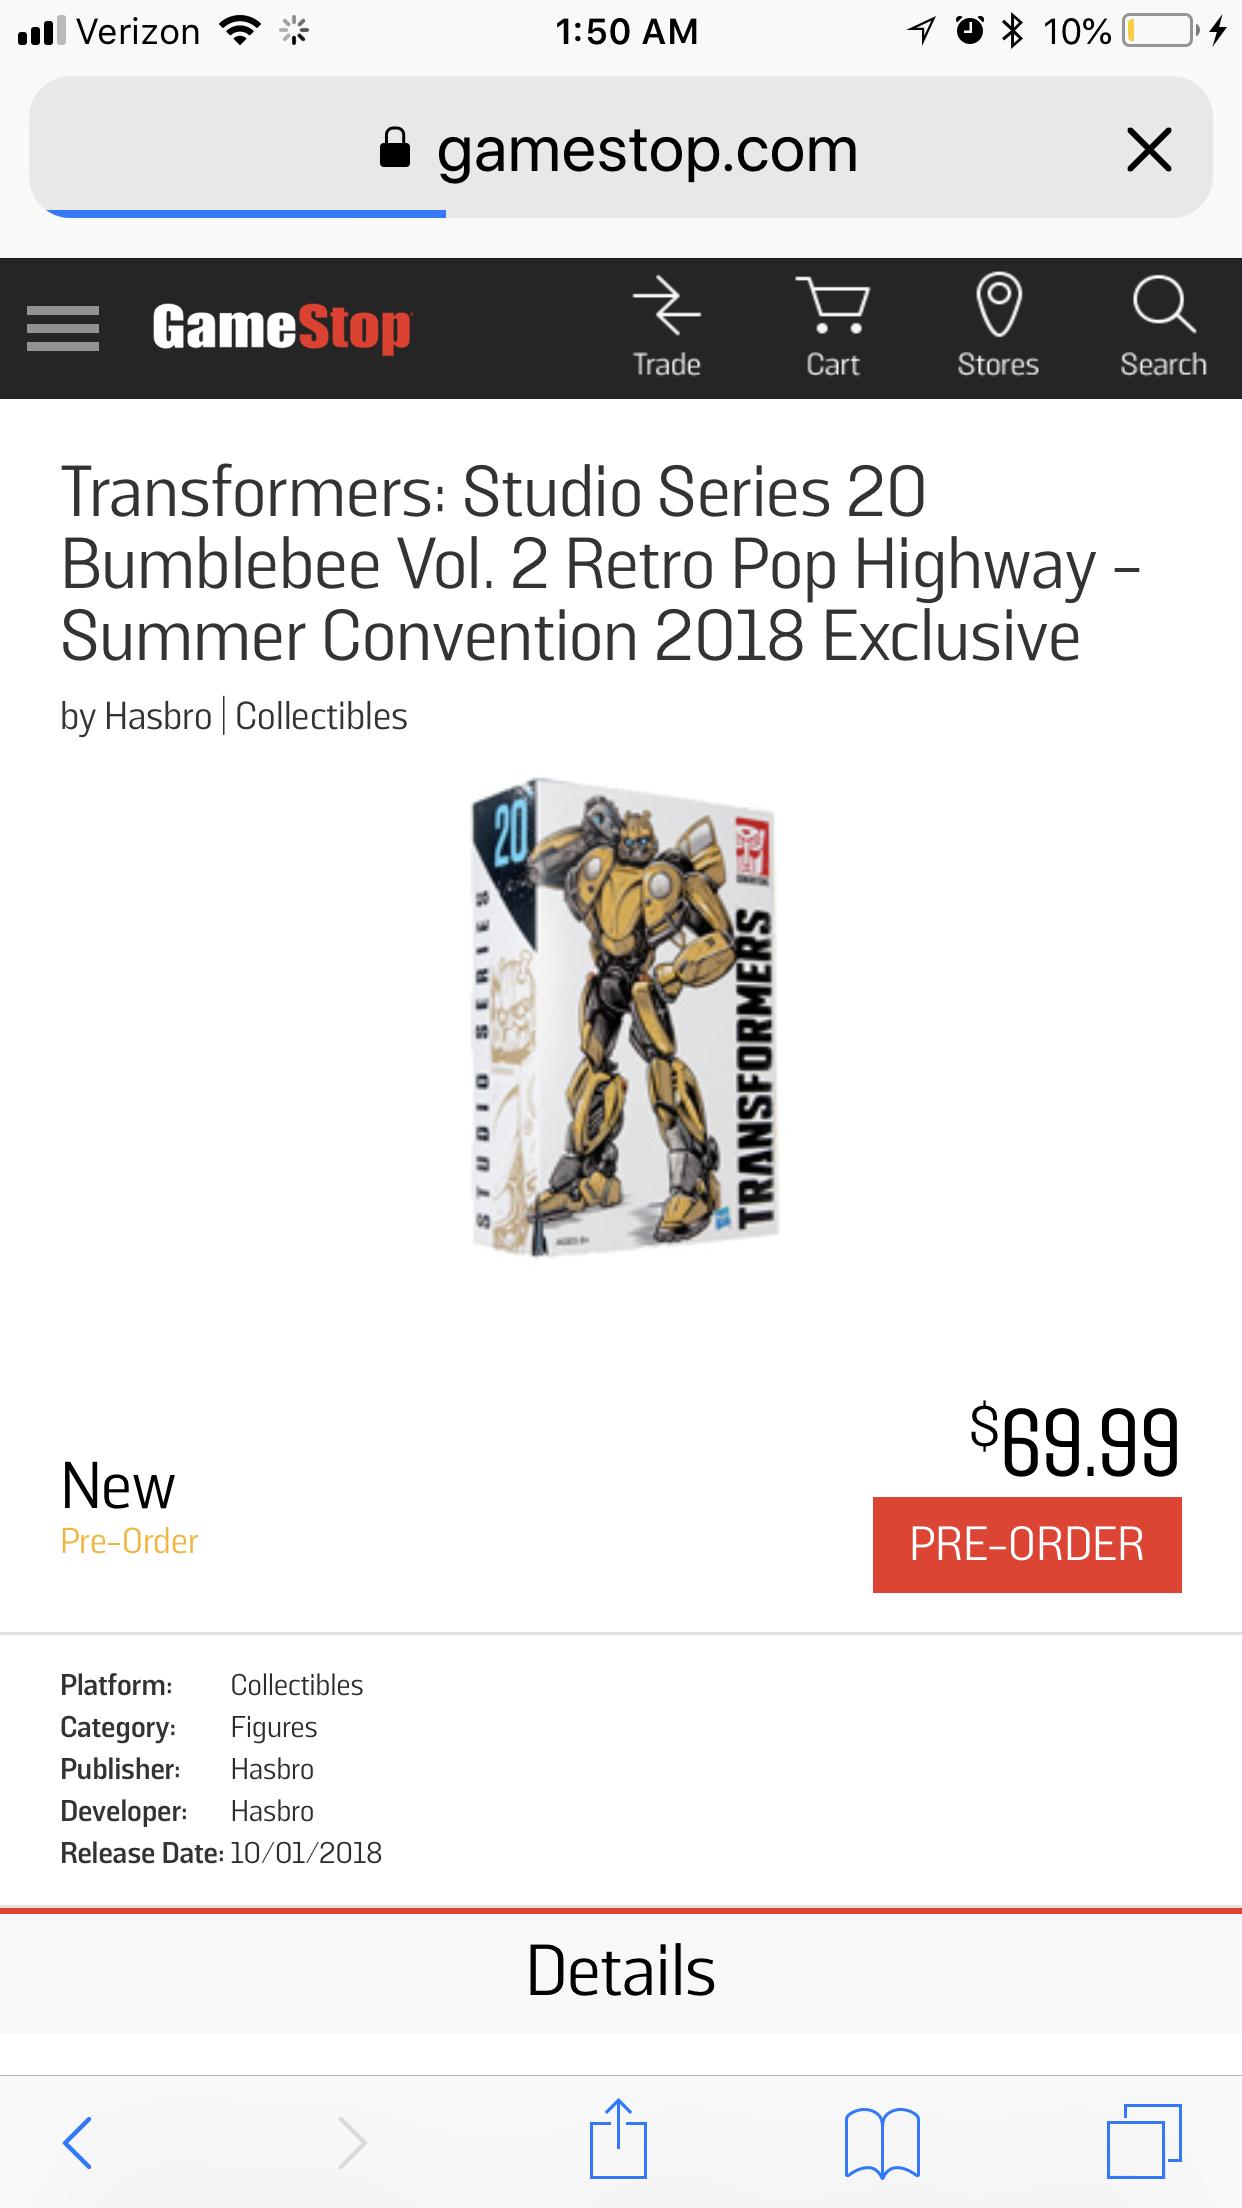 Transformers News: Transformers Studio Series 20 Bumblebee Retro Pop Garage vol 2 up for Preorder at Gamestop